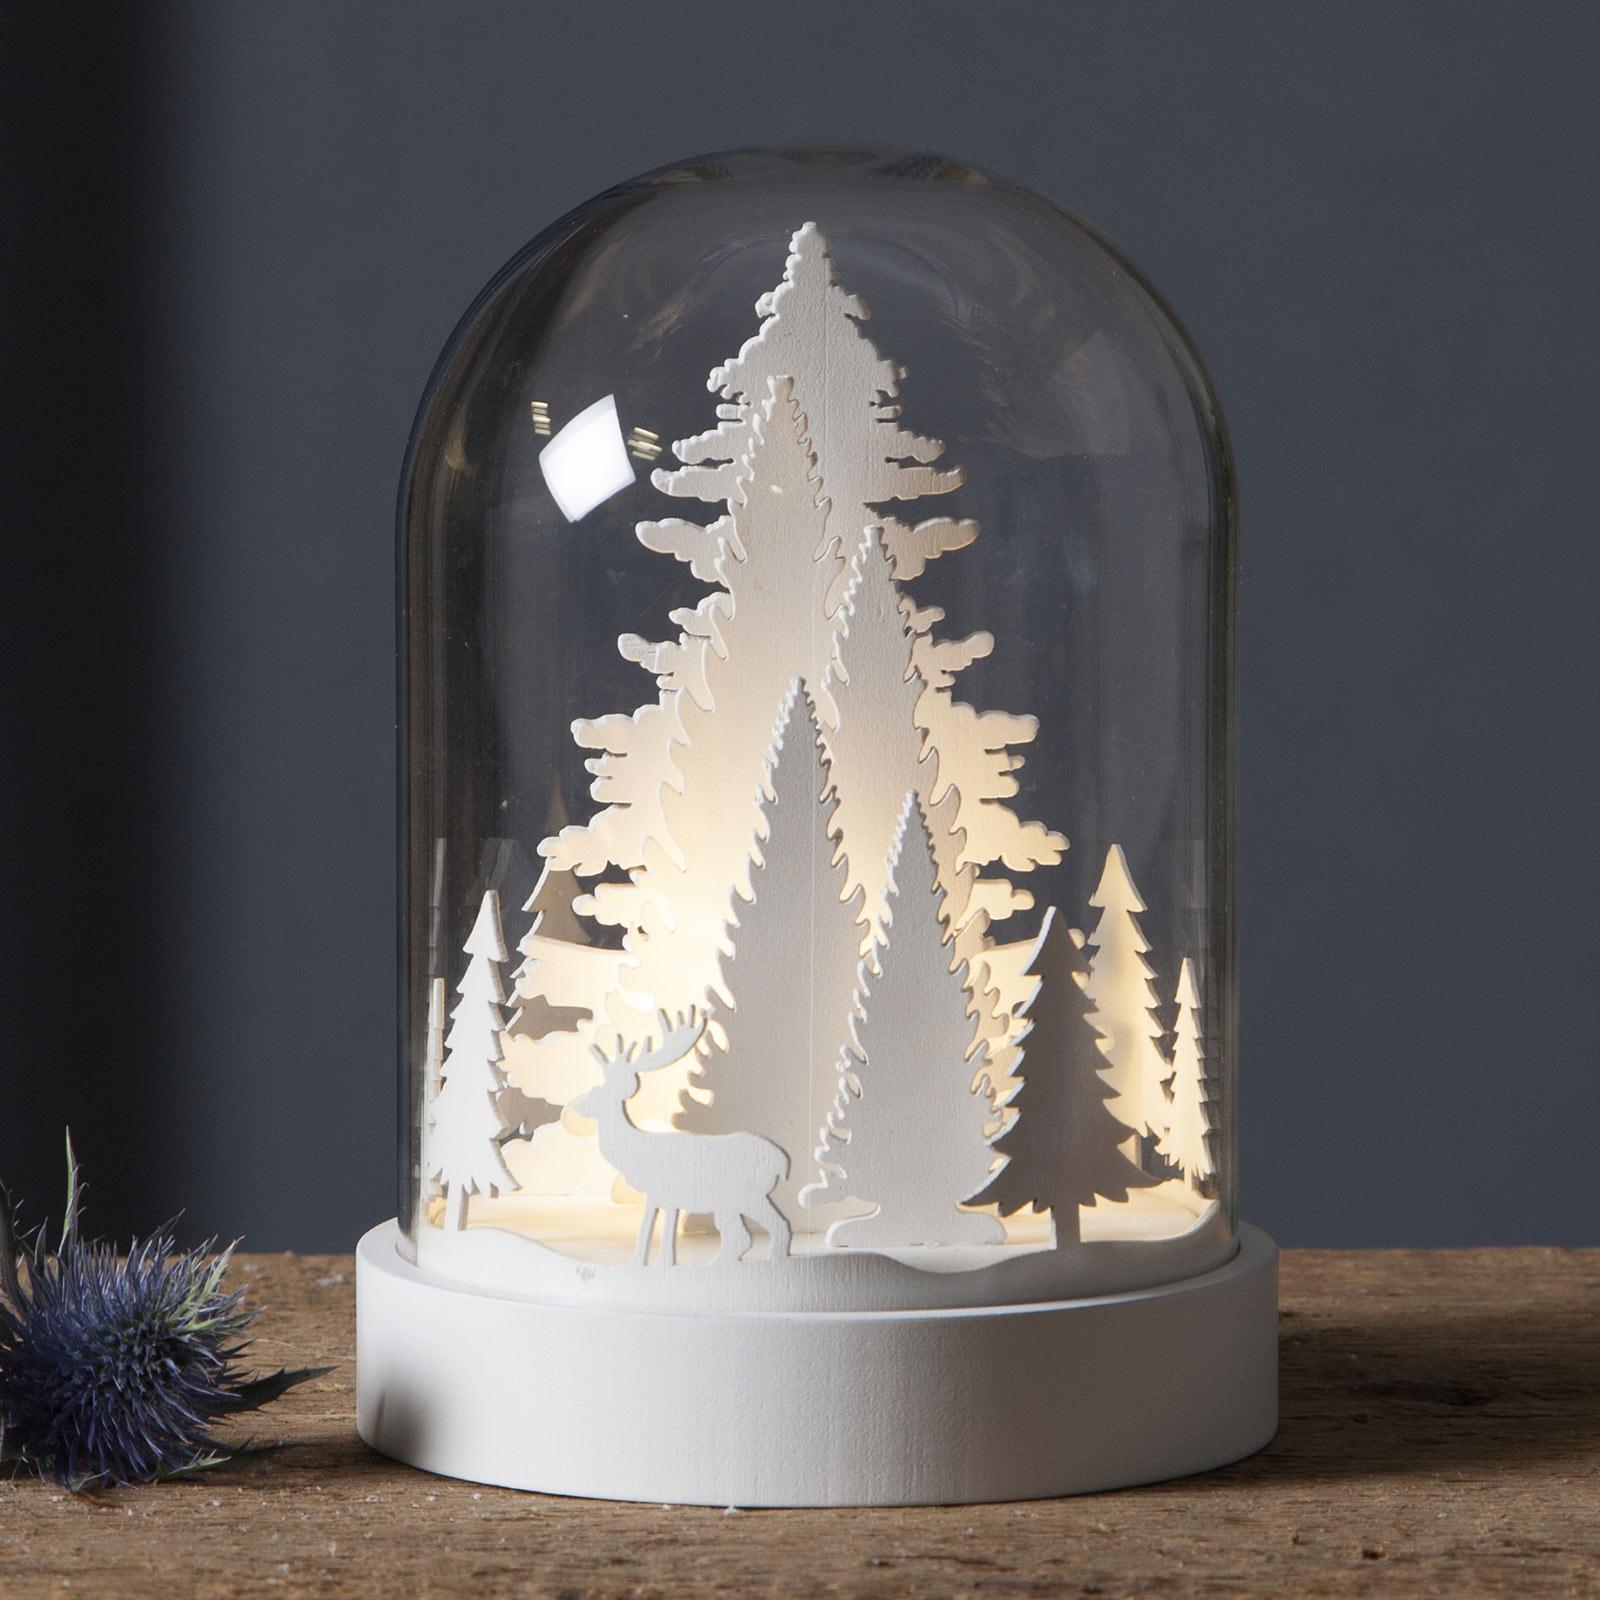 Kupol LED-dekorationslampe med skovscene